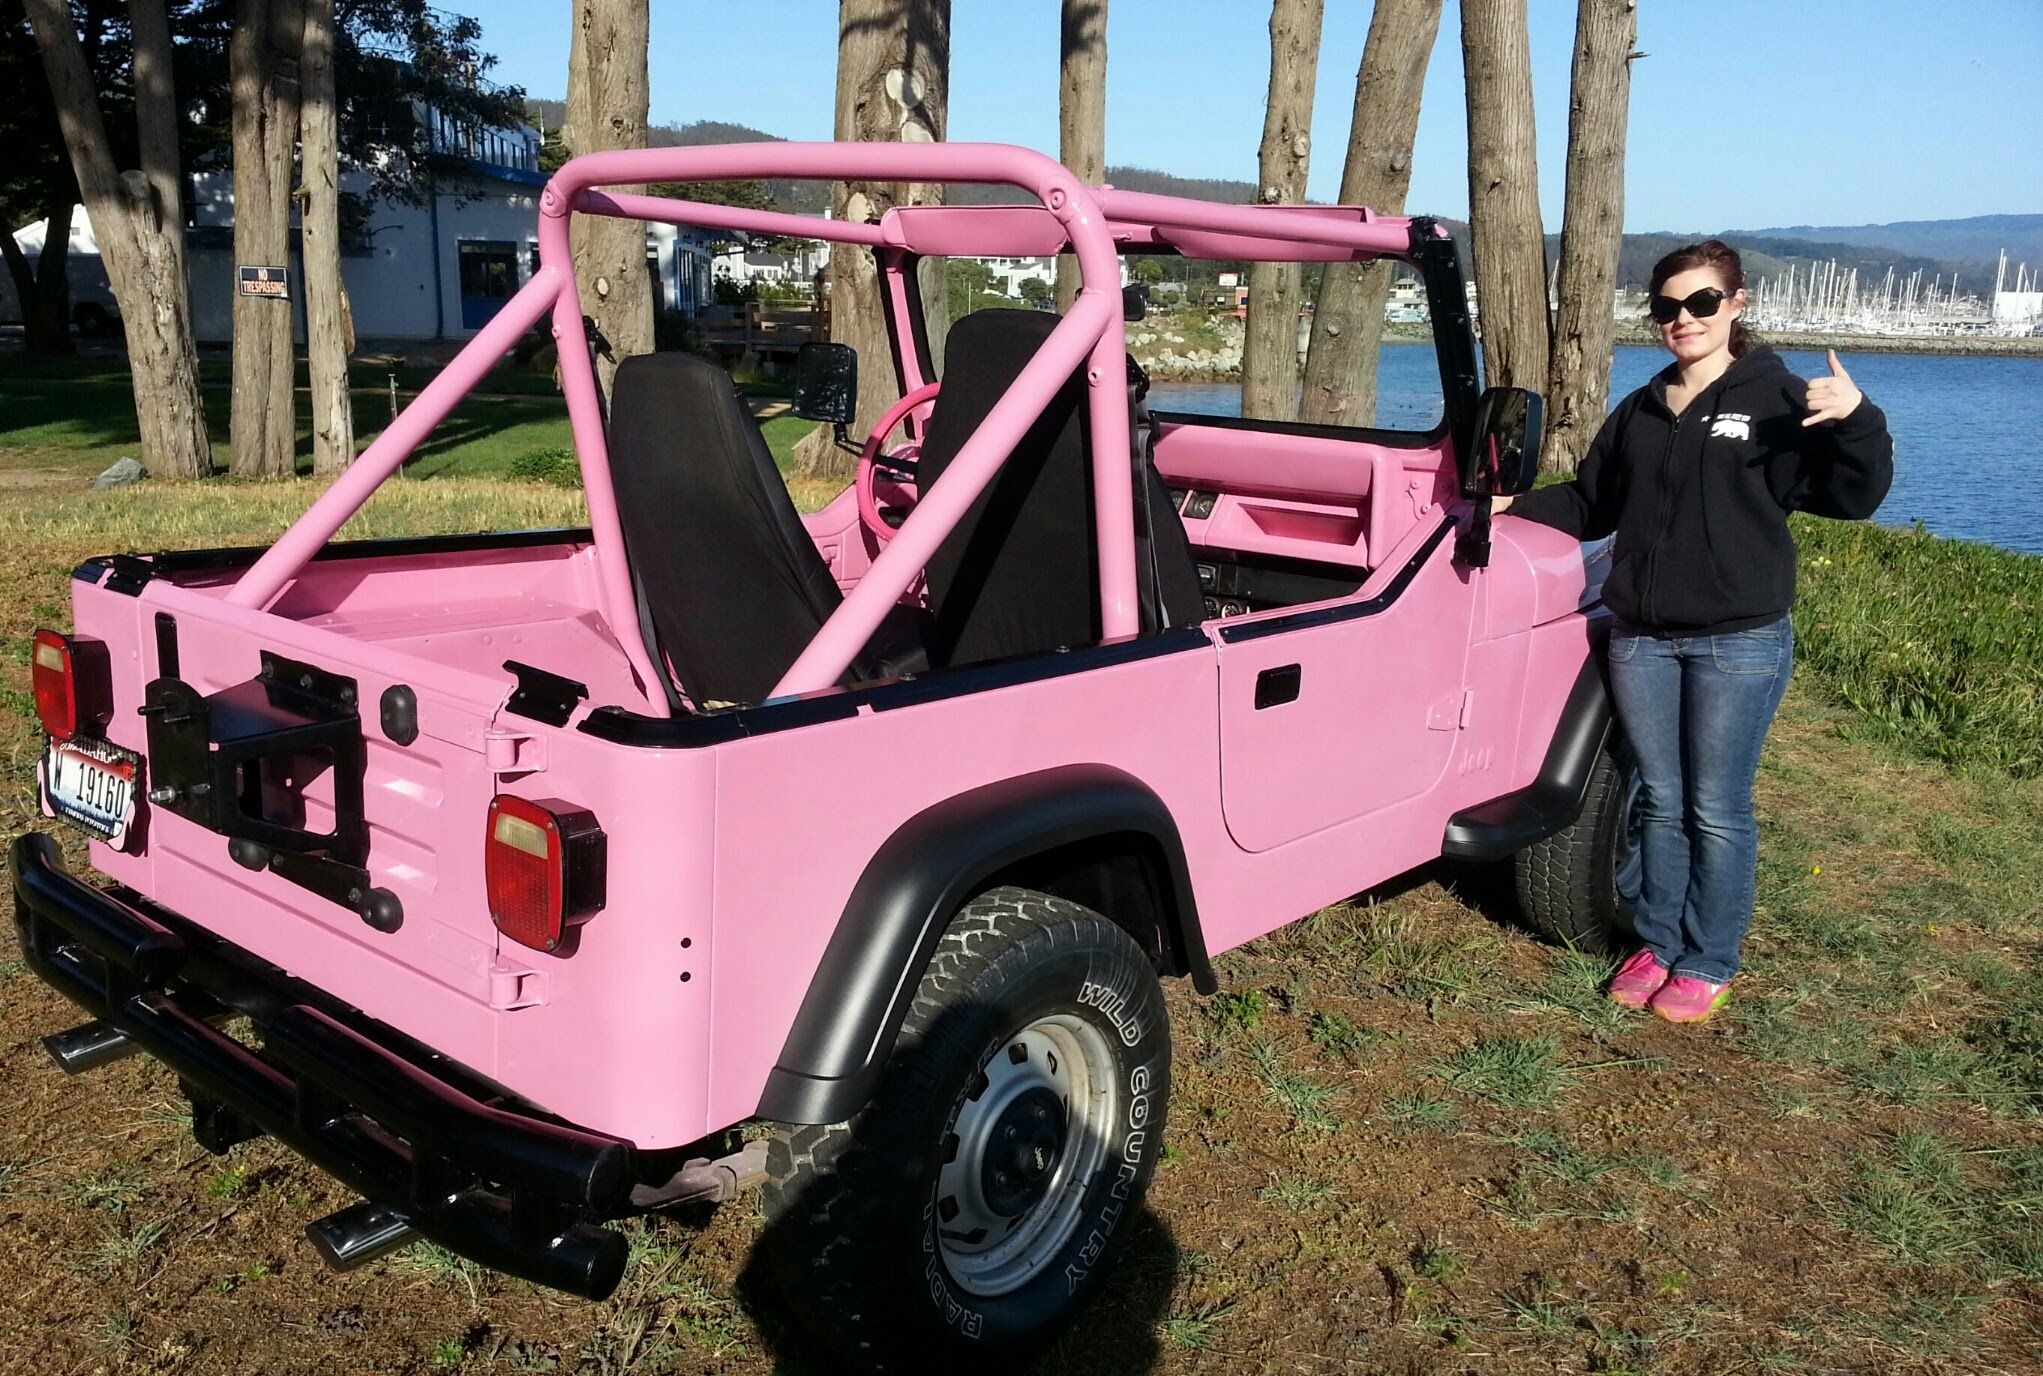 Pink Yj Jeep Google Search Pink Jeep Pink Jeep Wrangler Jeep Wrangler